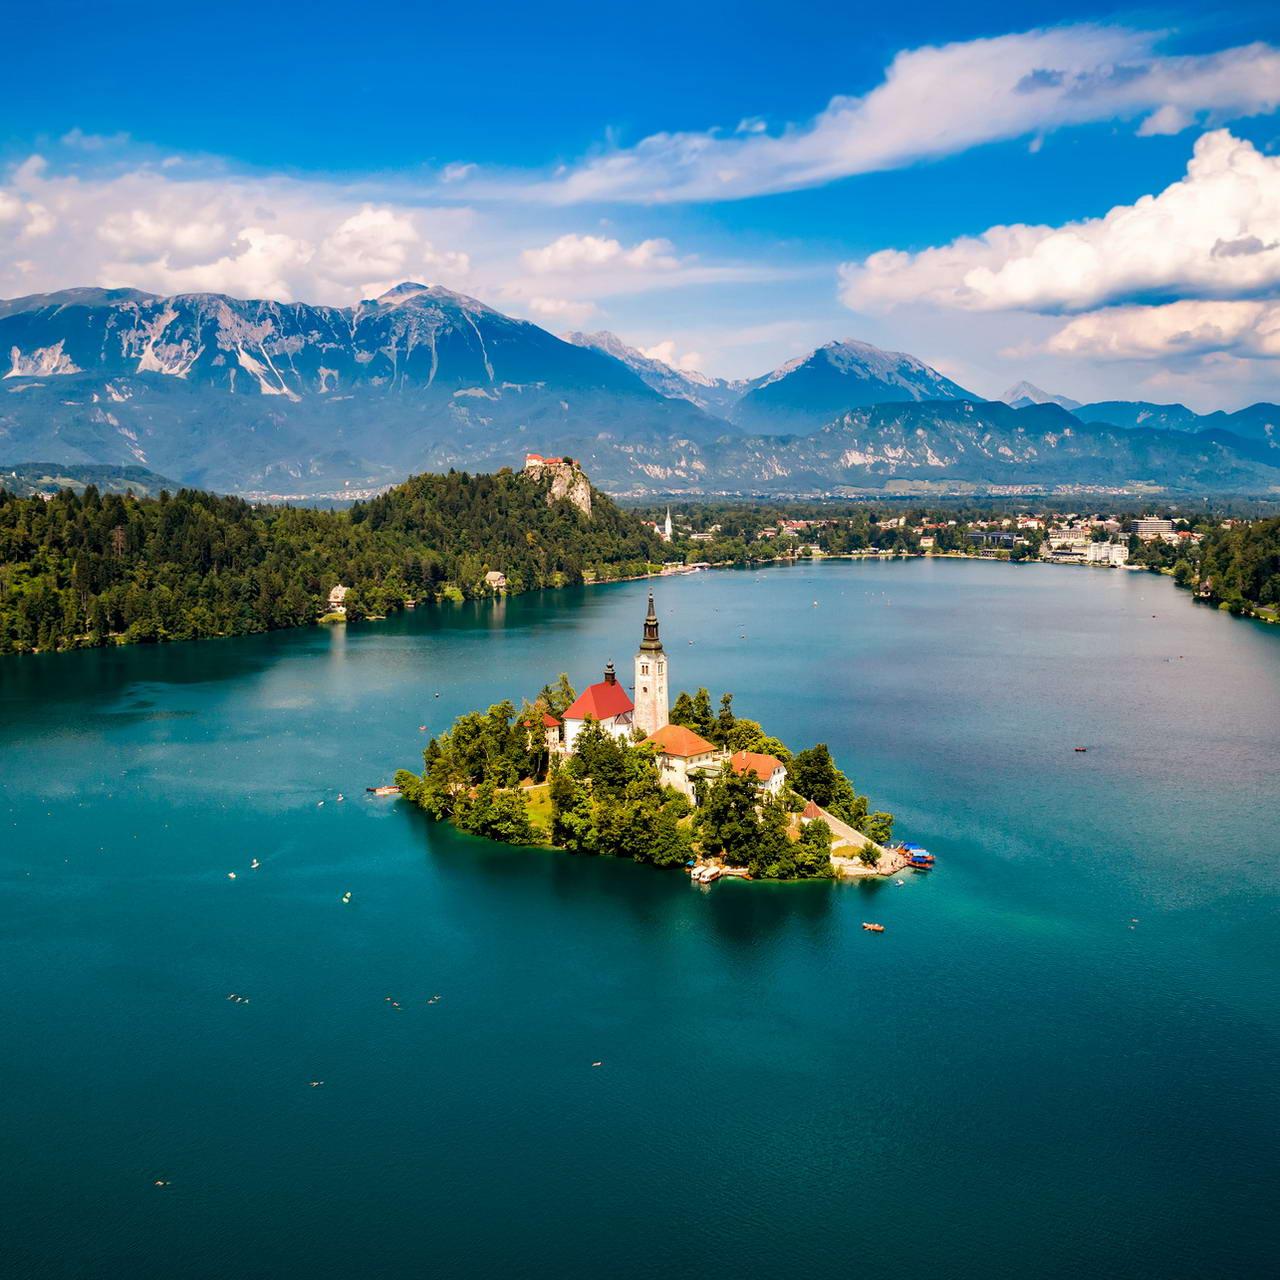 https://www.bestslovakiatours.com/wp-content/uploads/2021/09/Best-Slovakia-Tours_Slovenia_resize.jpg